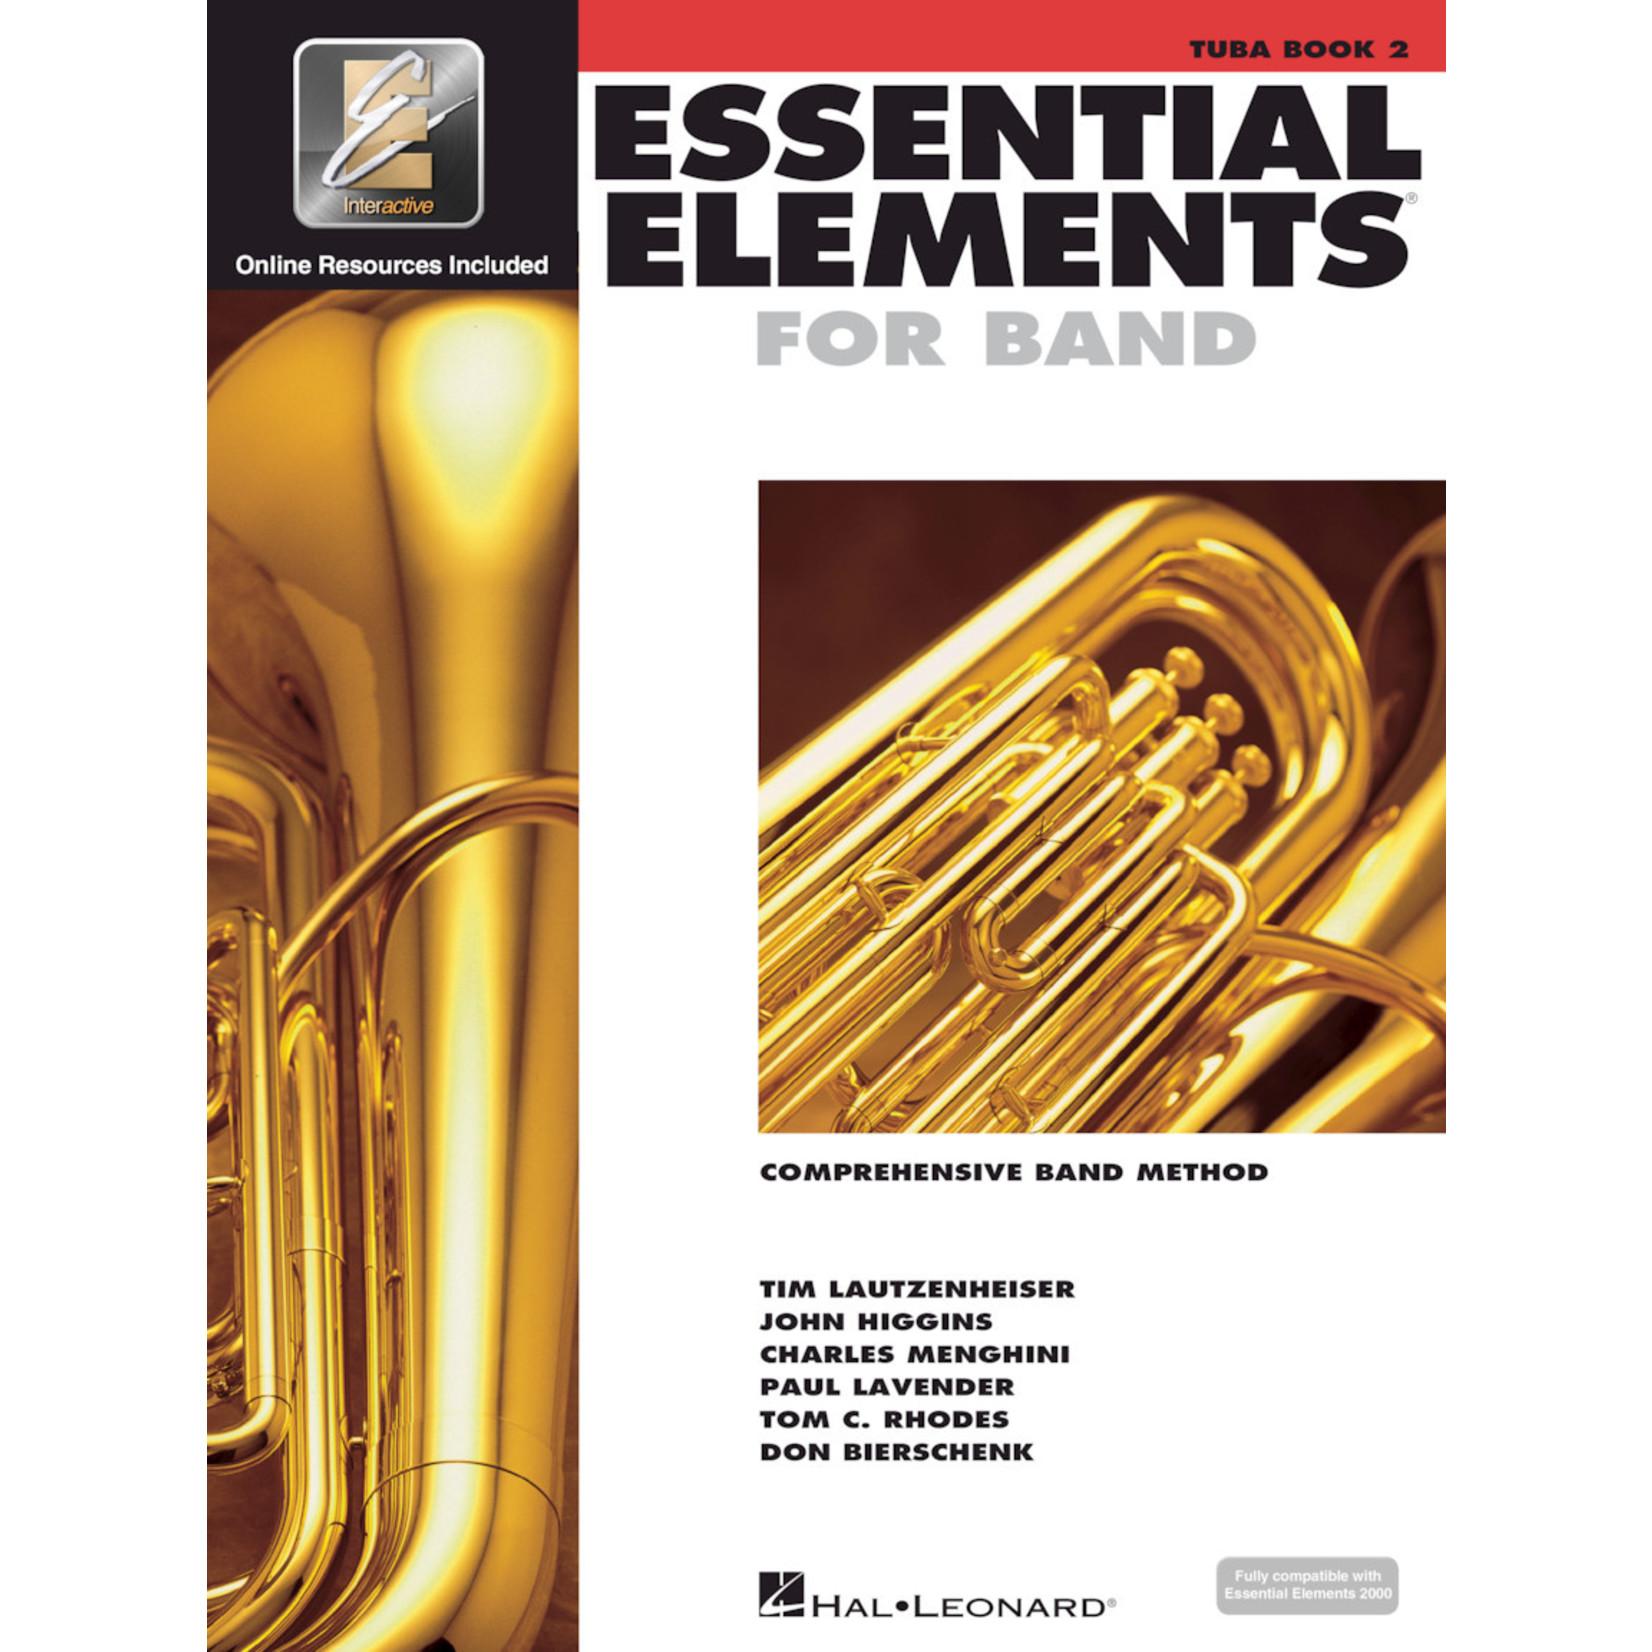 Hal Leonard Essential Elements for Band Tuba Book 2